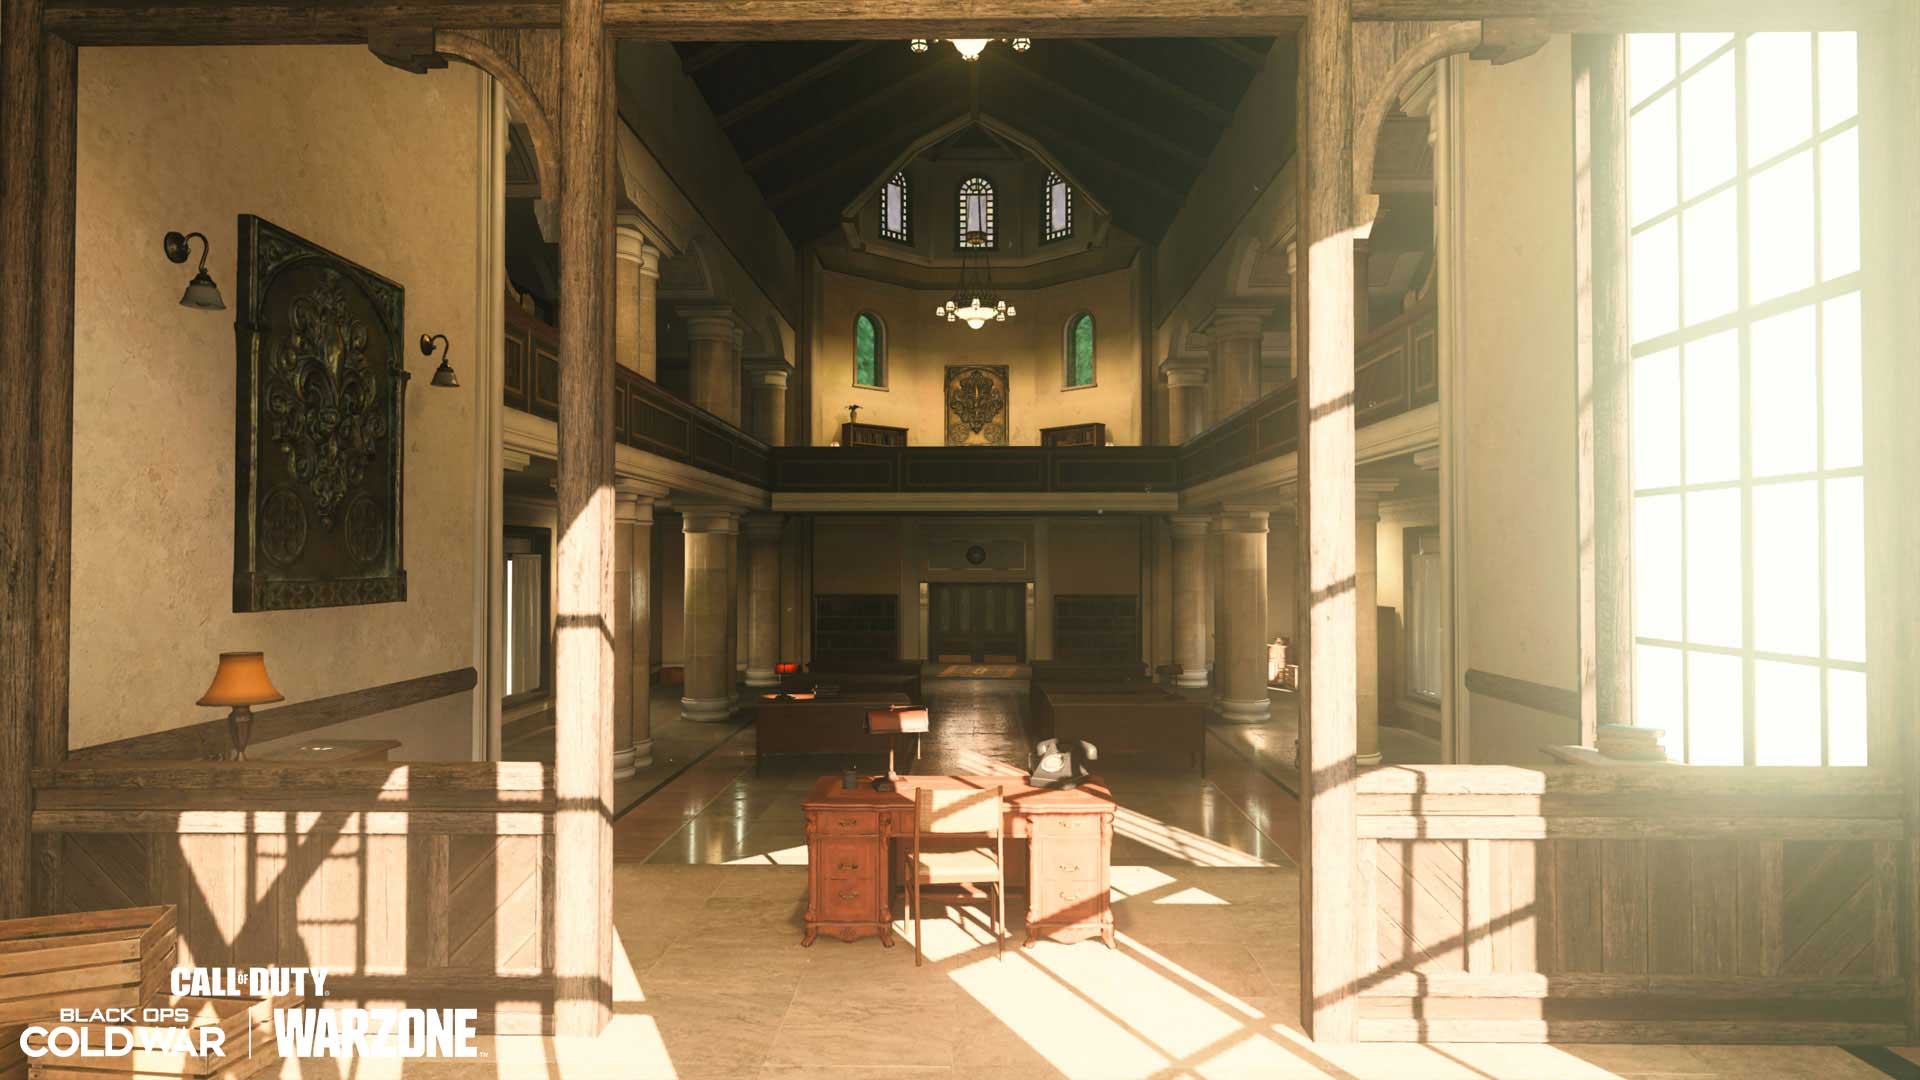 Standoff: Town Hall Interior (1F):